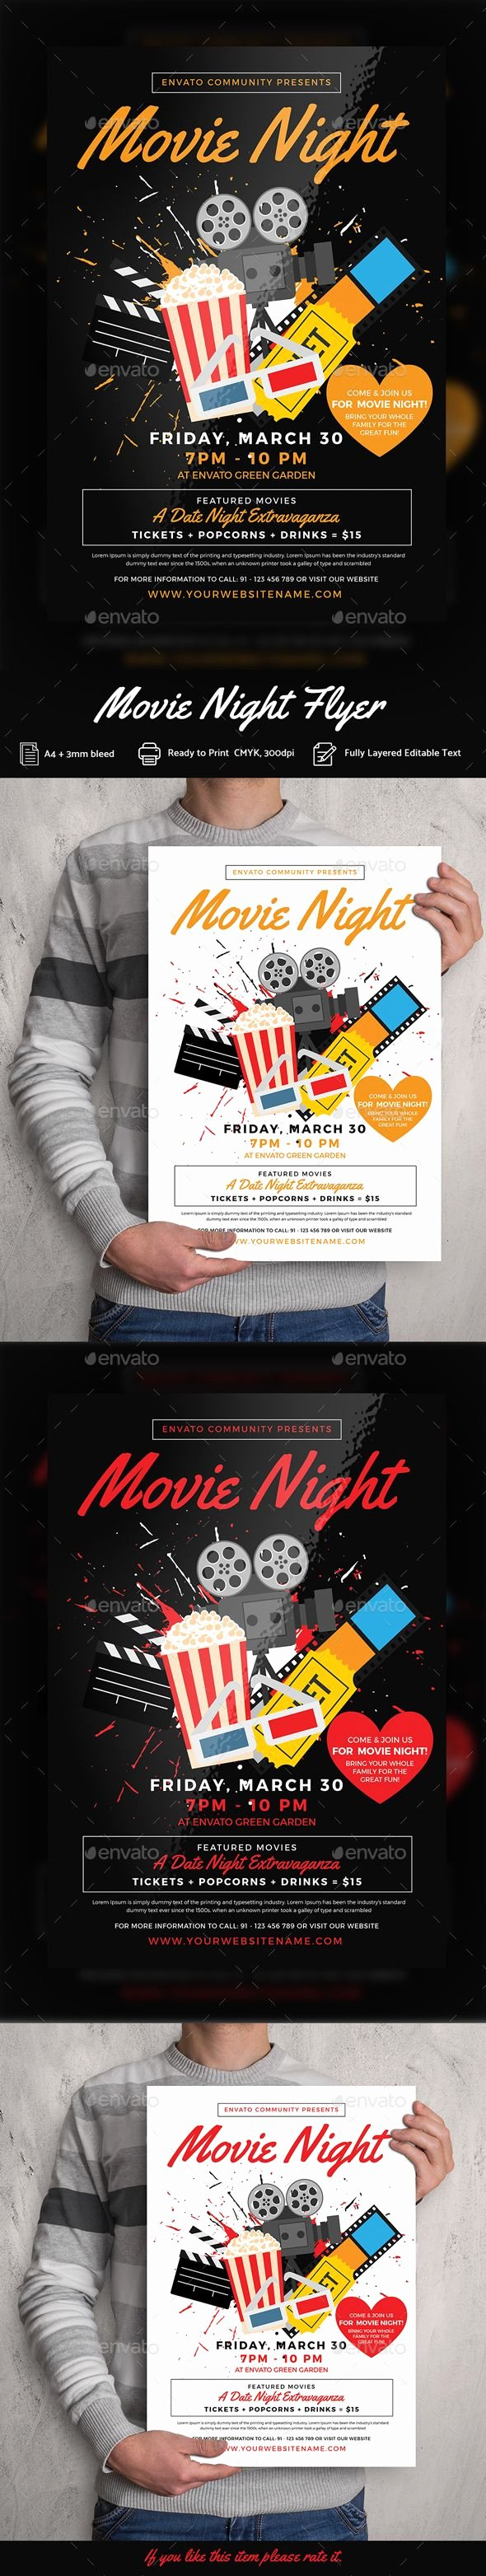 Movie Night Flyer Templates Luxury Movie Night Flyer Templates